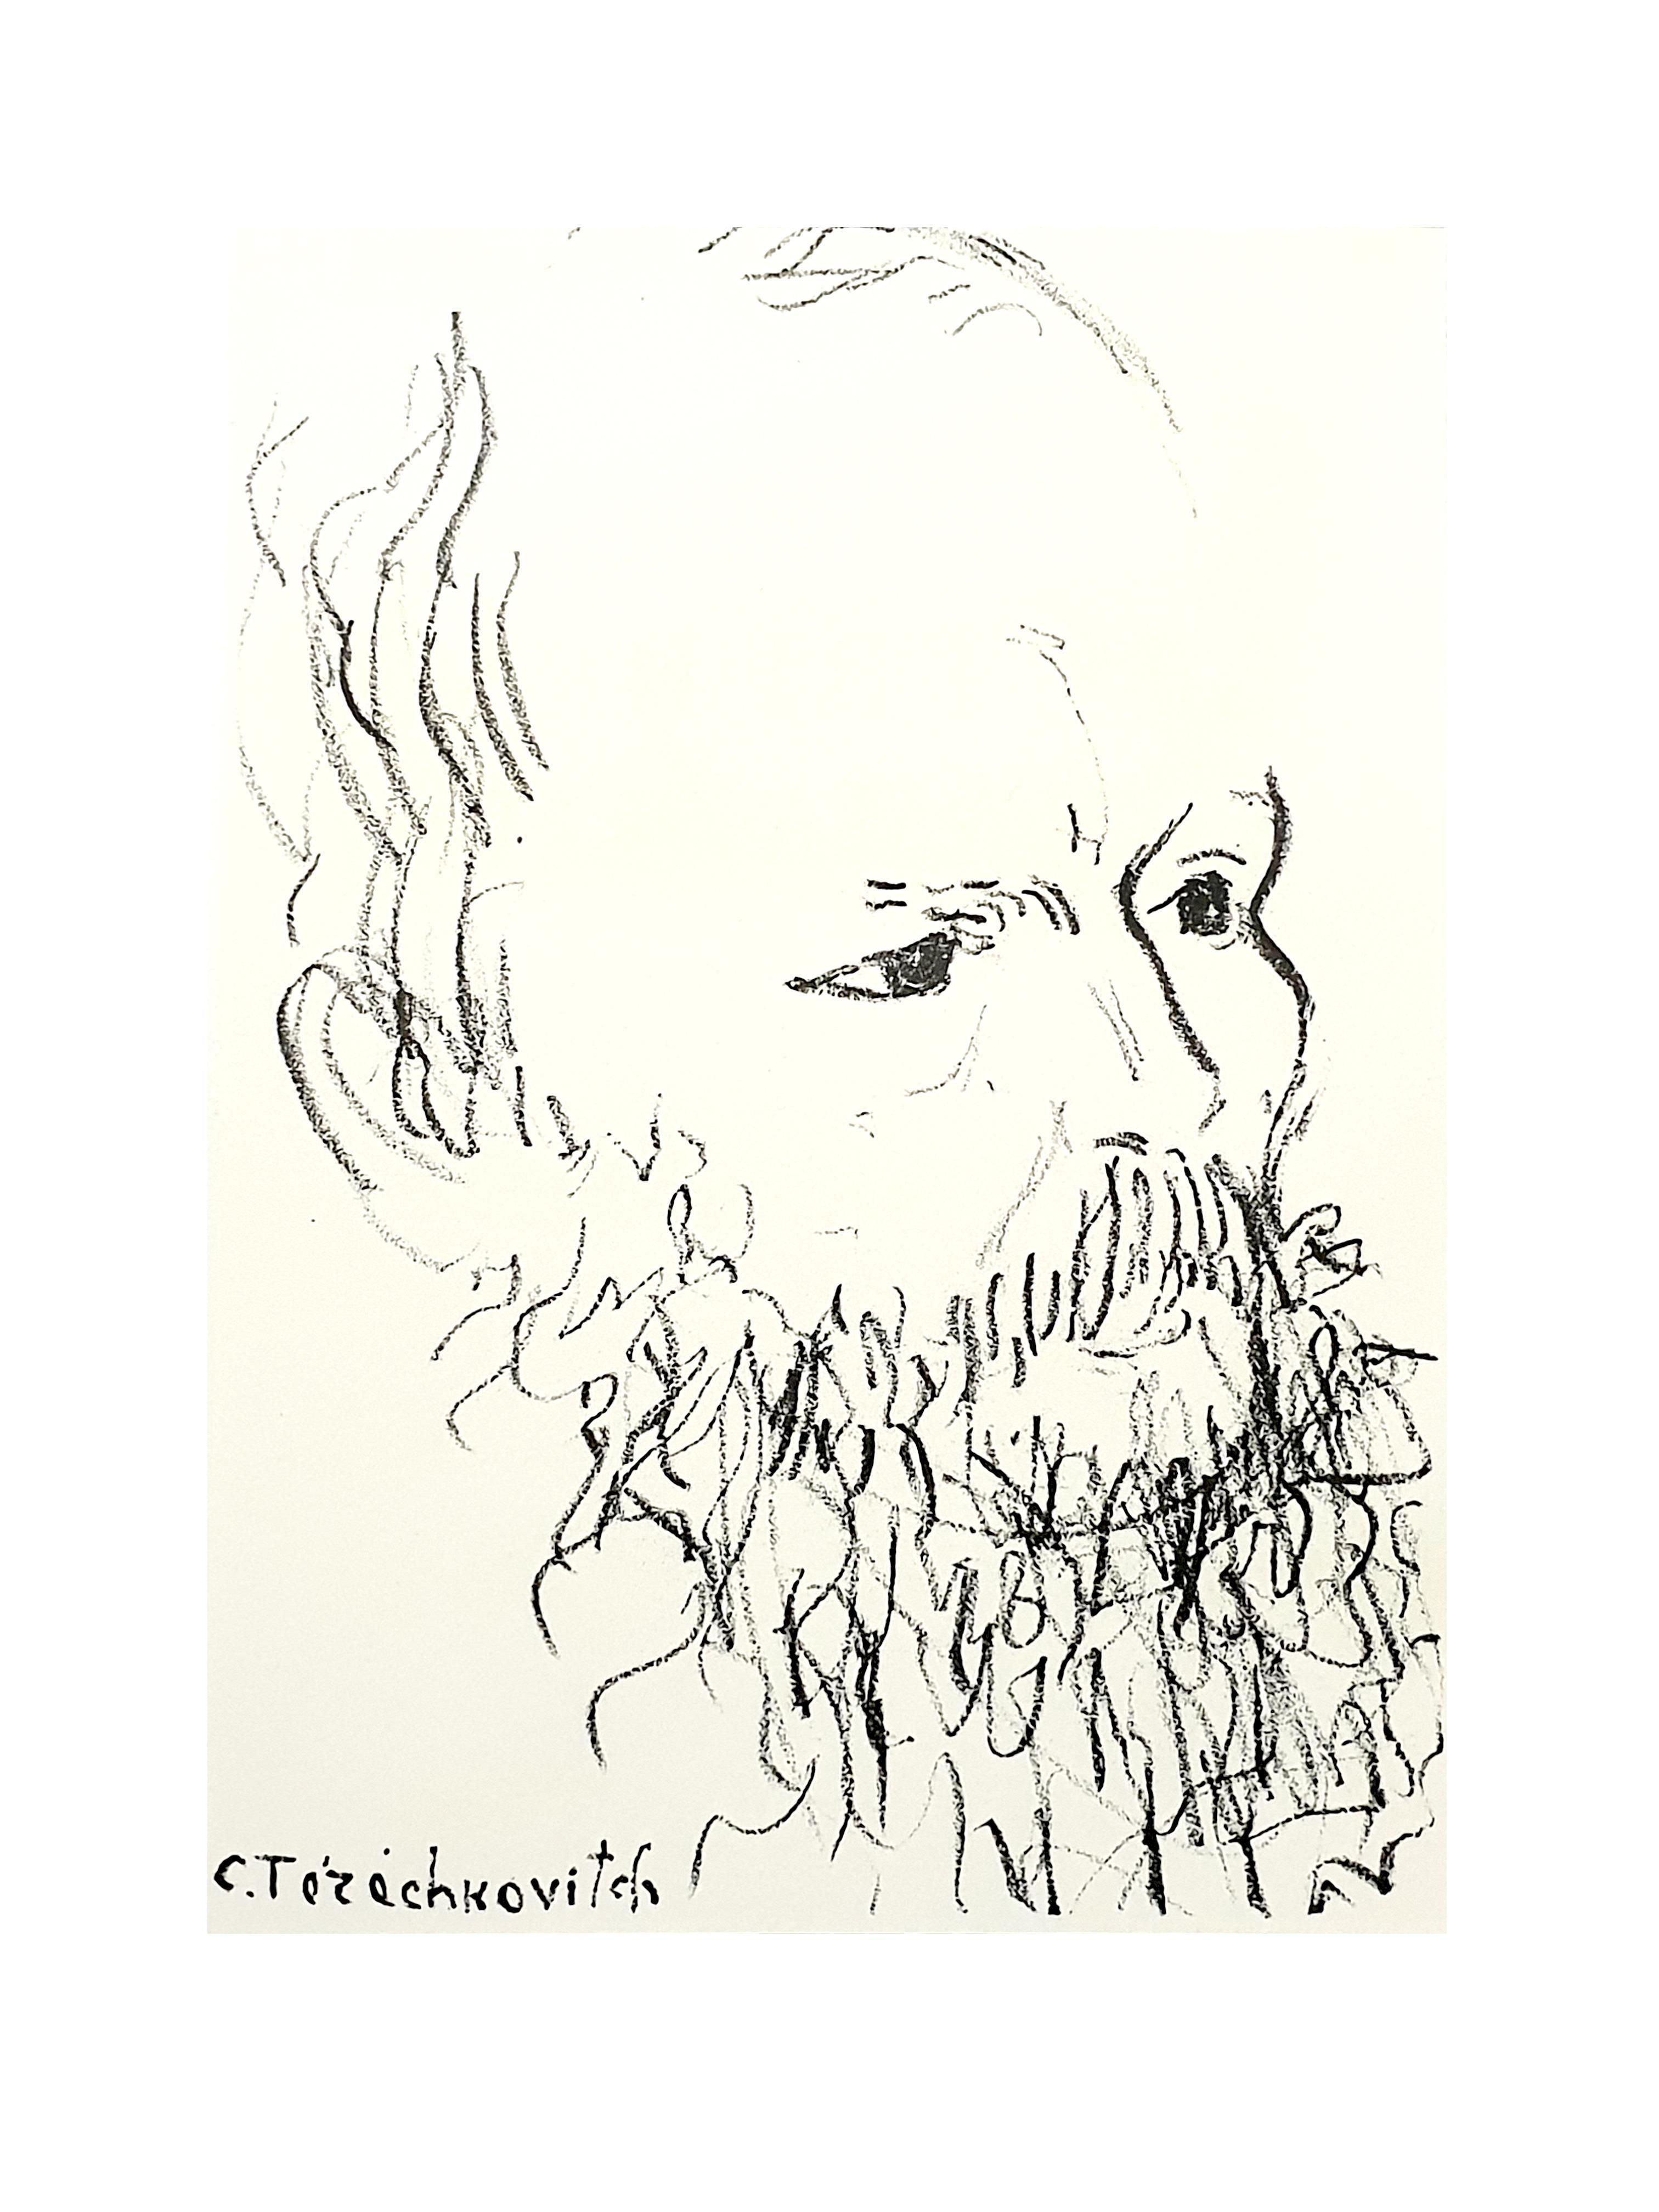 Constantin Terechkovitch - Portrait - Original Lithograph